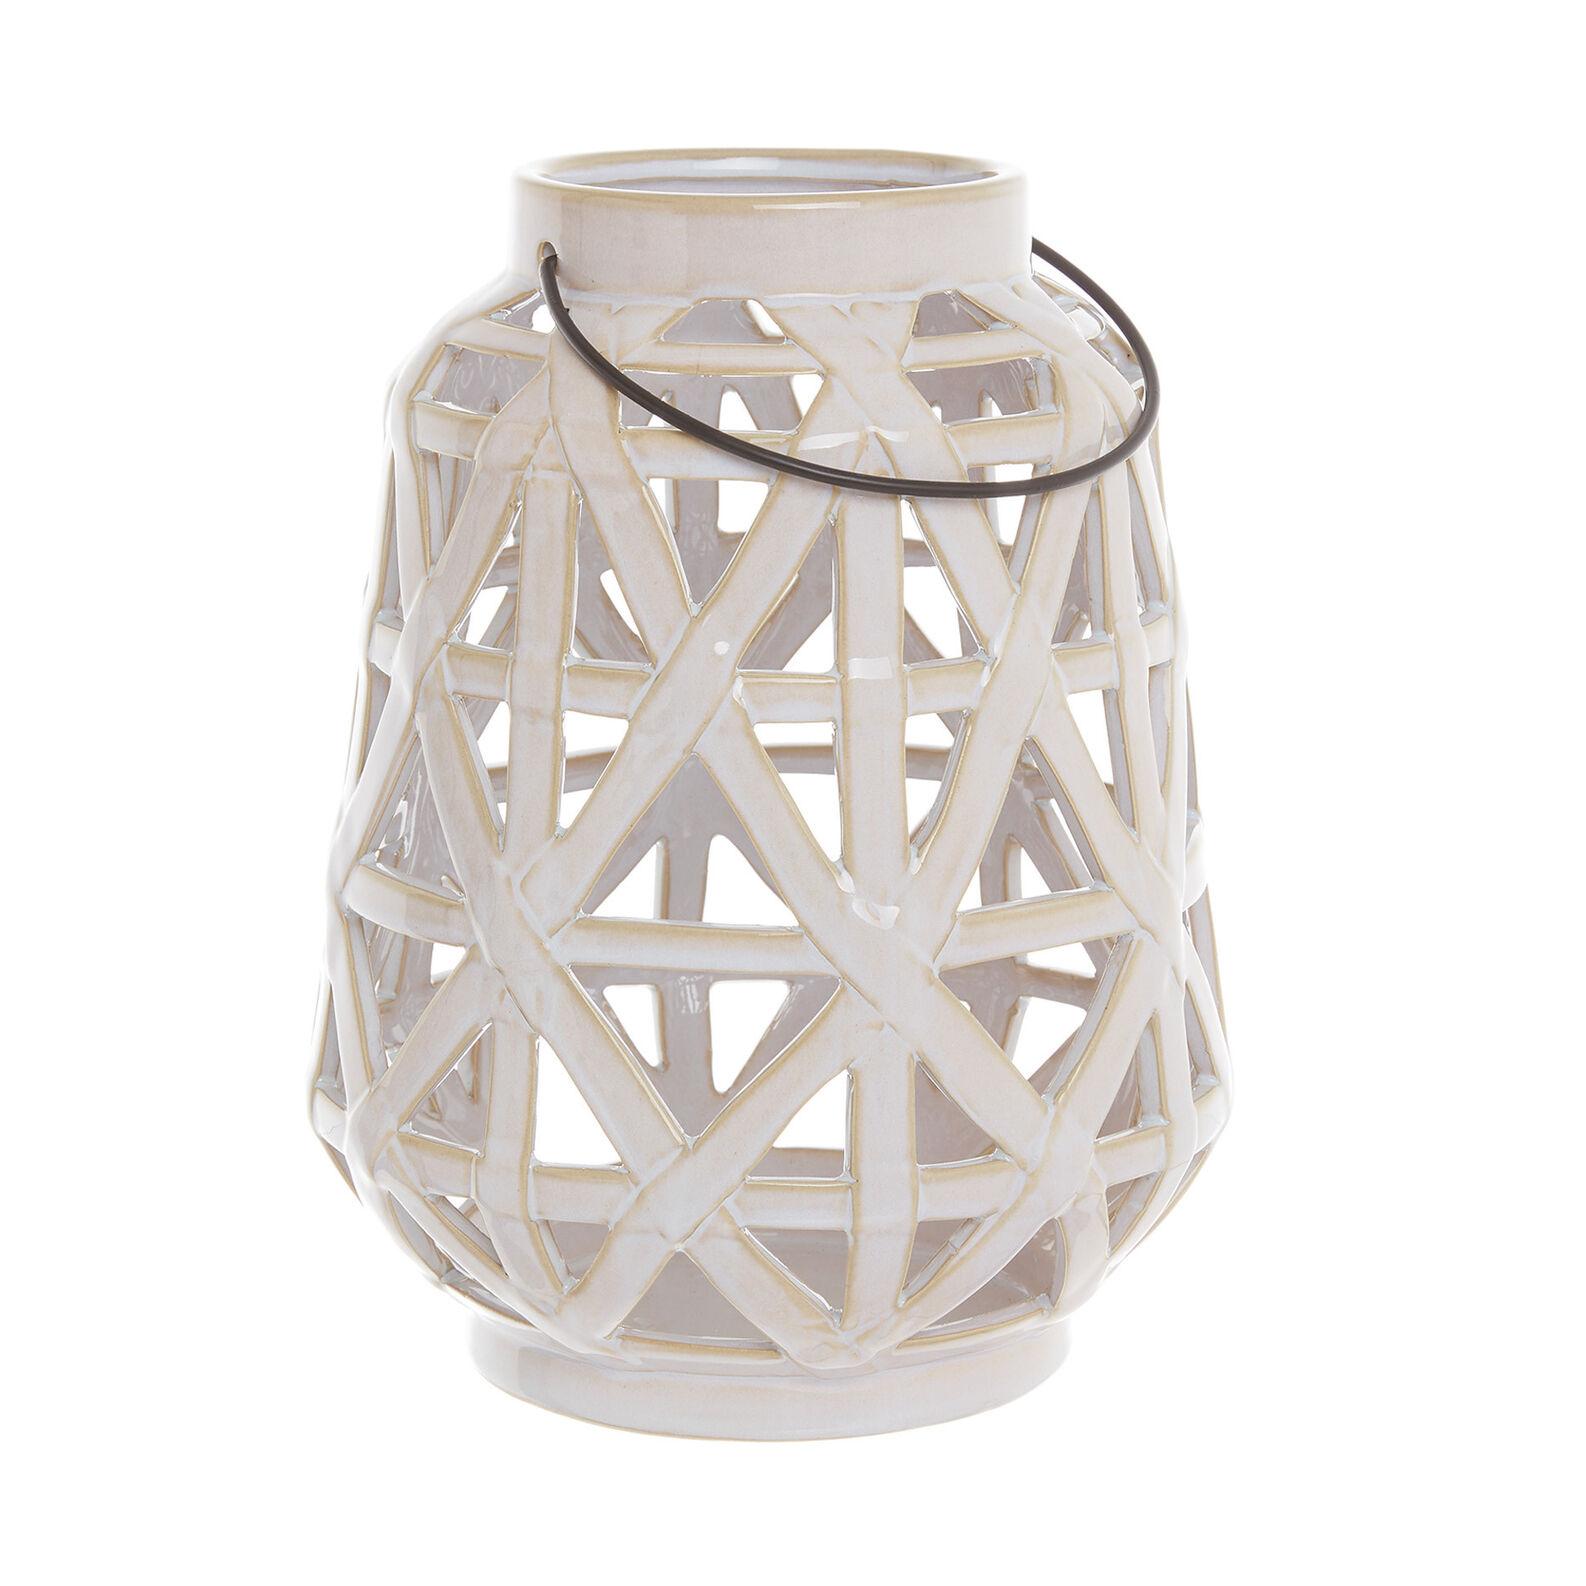 Handmade ceramic lantern